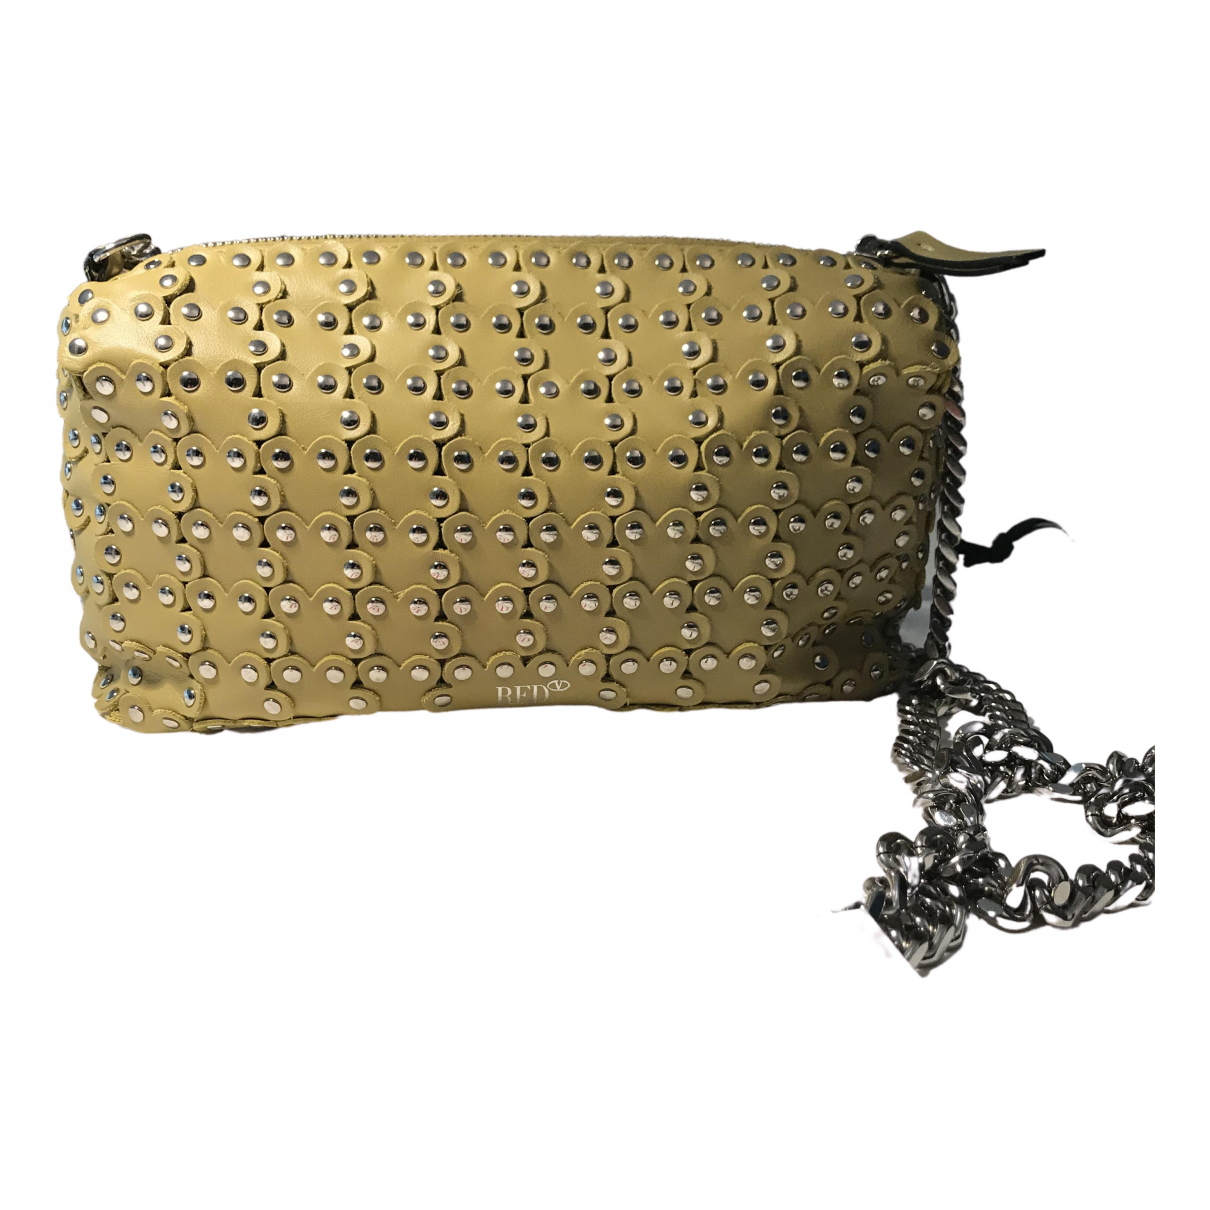 Red Valentino Garavani N Green Leather handbag for Women N